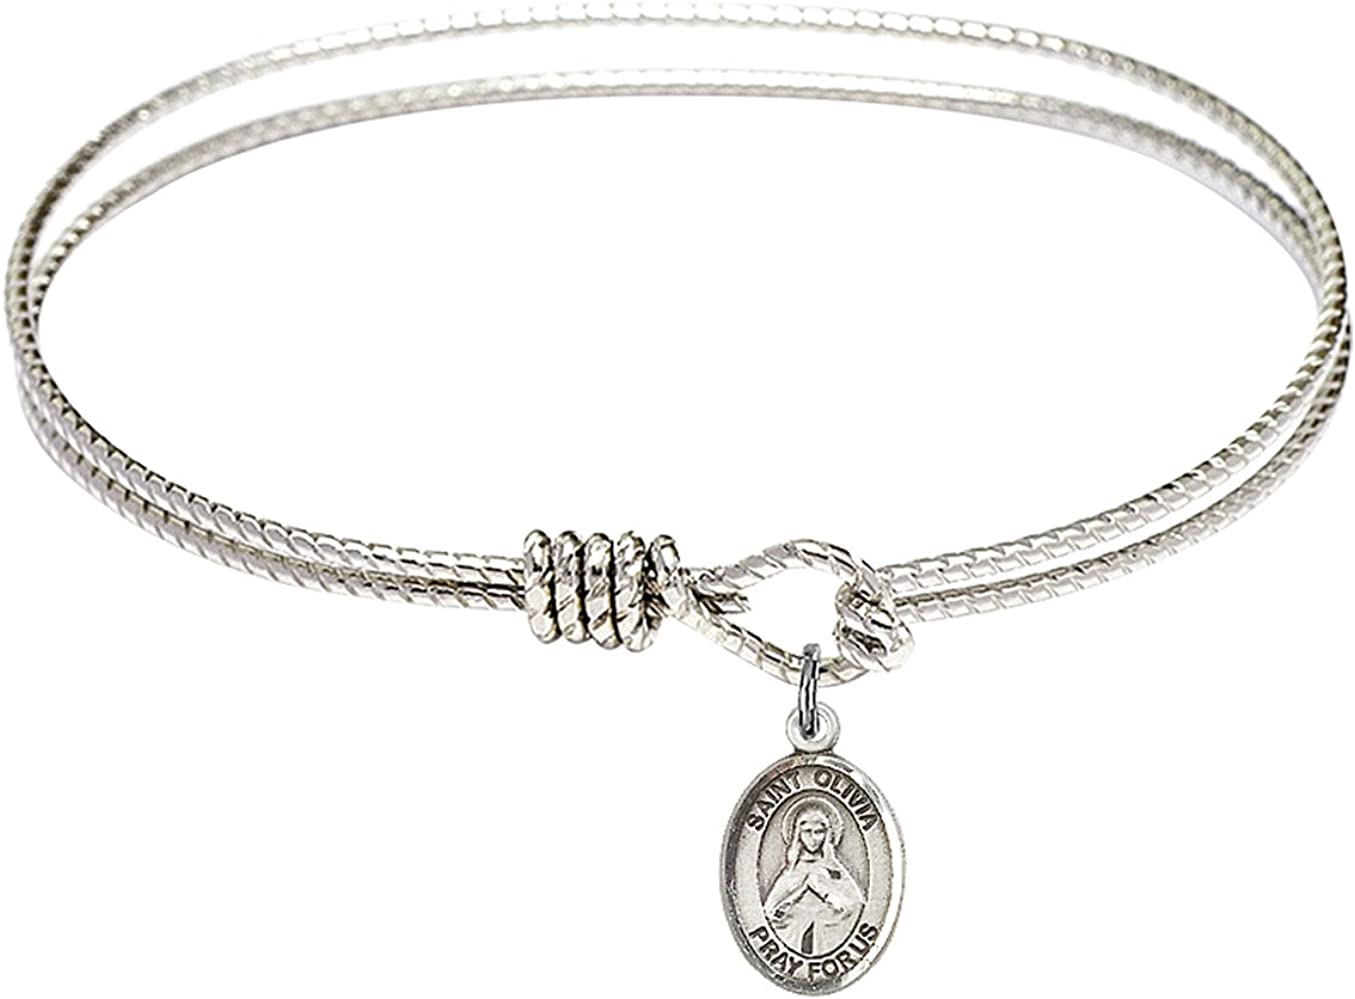 Bonyak Jewelry Oval Eye Hook Popular products Bangle St. Bracelet Max 81% OFF Ste w in Olivia